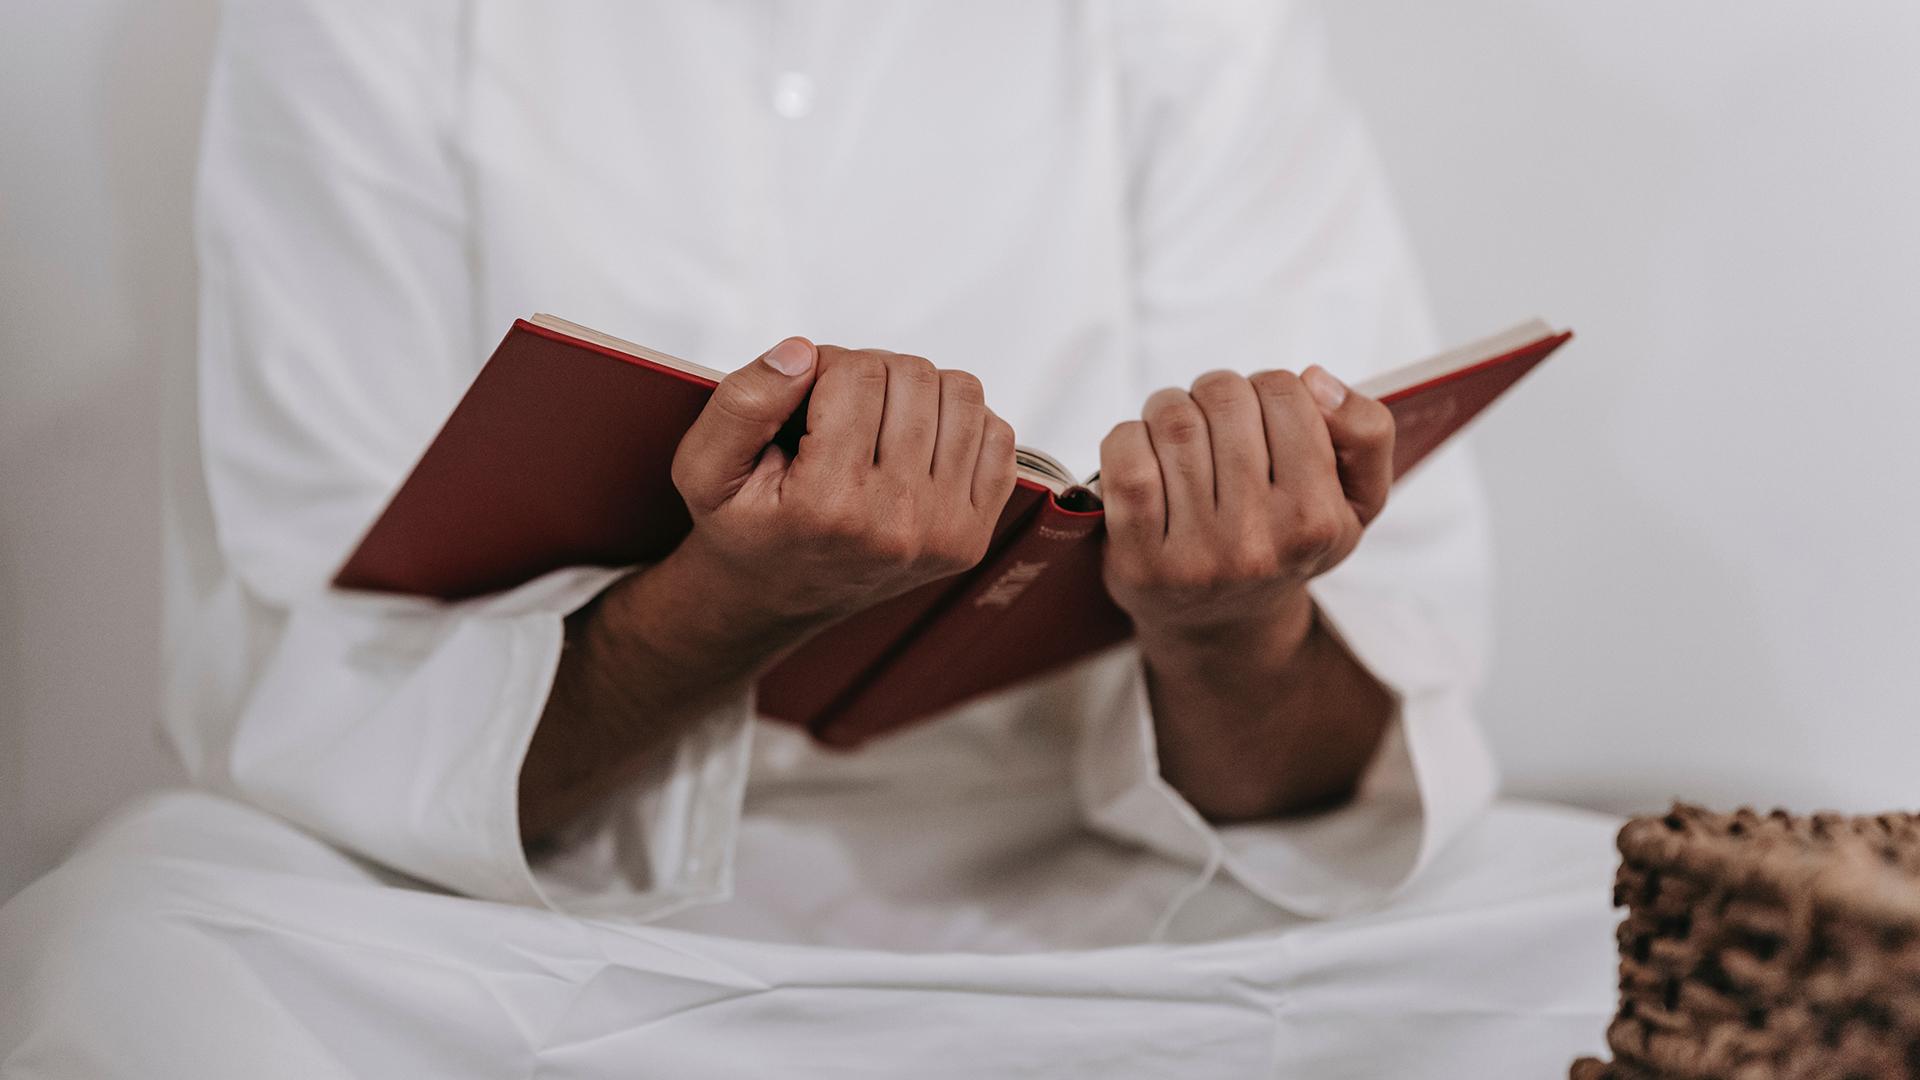 Bina-Qurani-Pengertian-Ikhlas-menurut-para-ulama-keutamaan-ikhlas